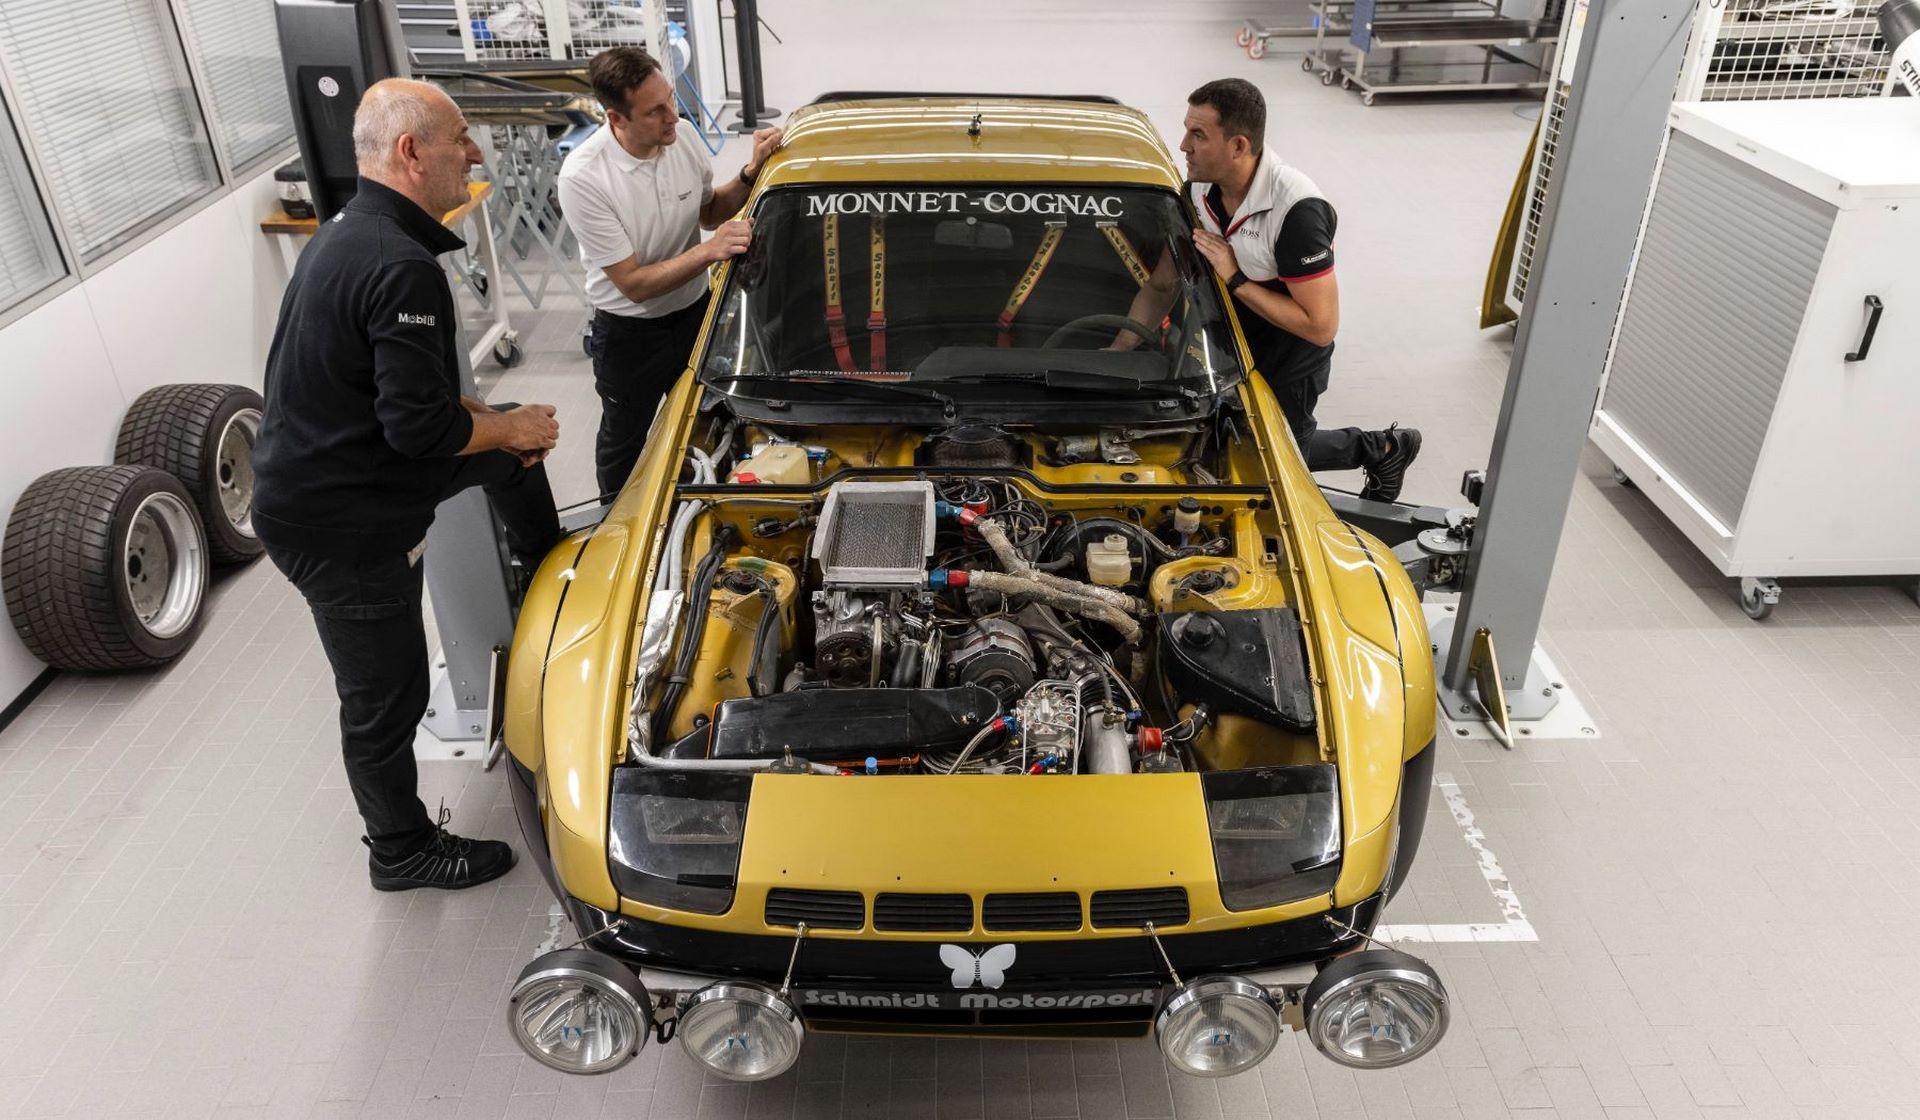 Porsche-924-Carrera-GTS-rally-car-Walter-Rohrl-28